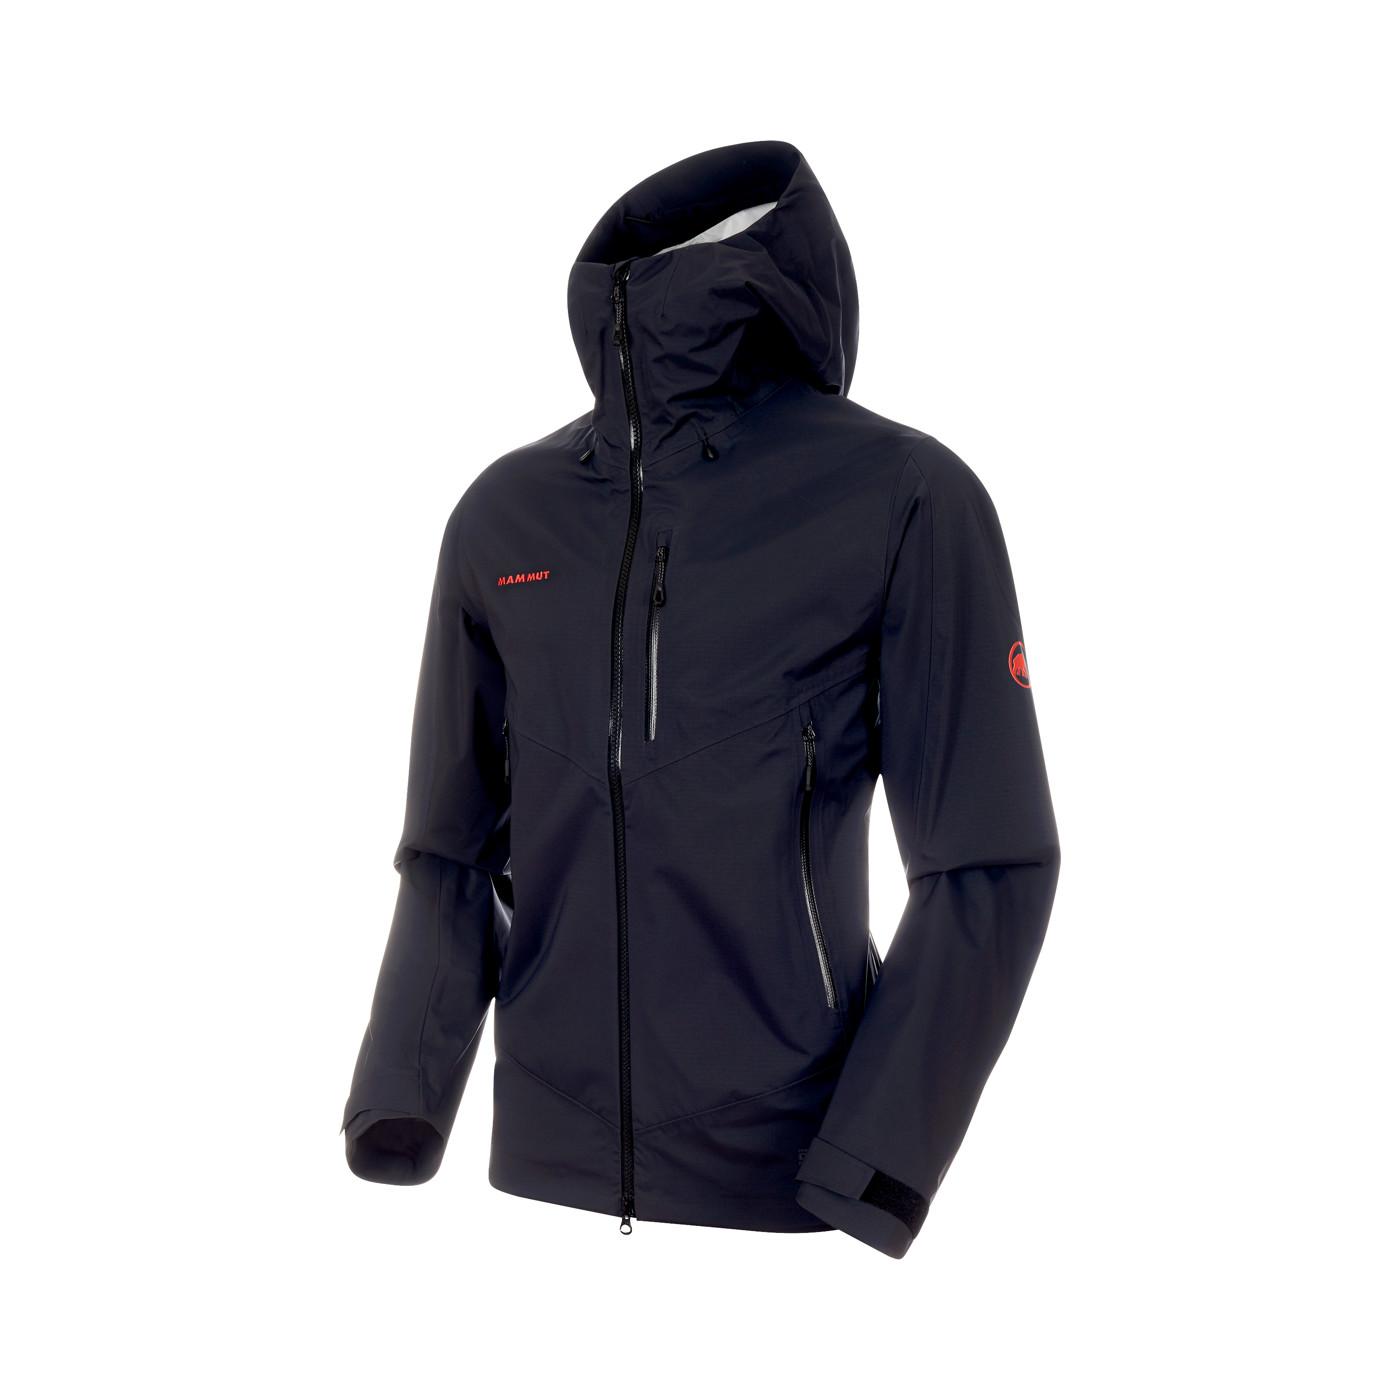 MAMMUT Kento HS Hooded Jacket - Herren